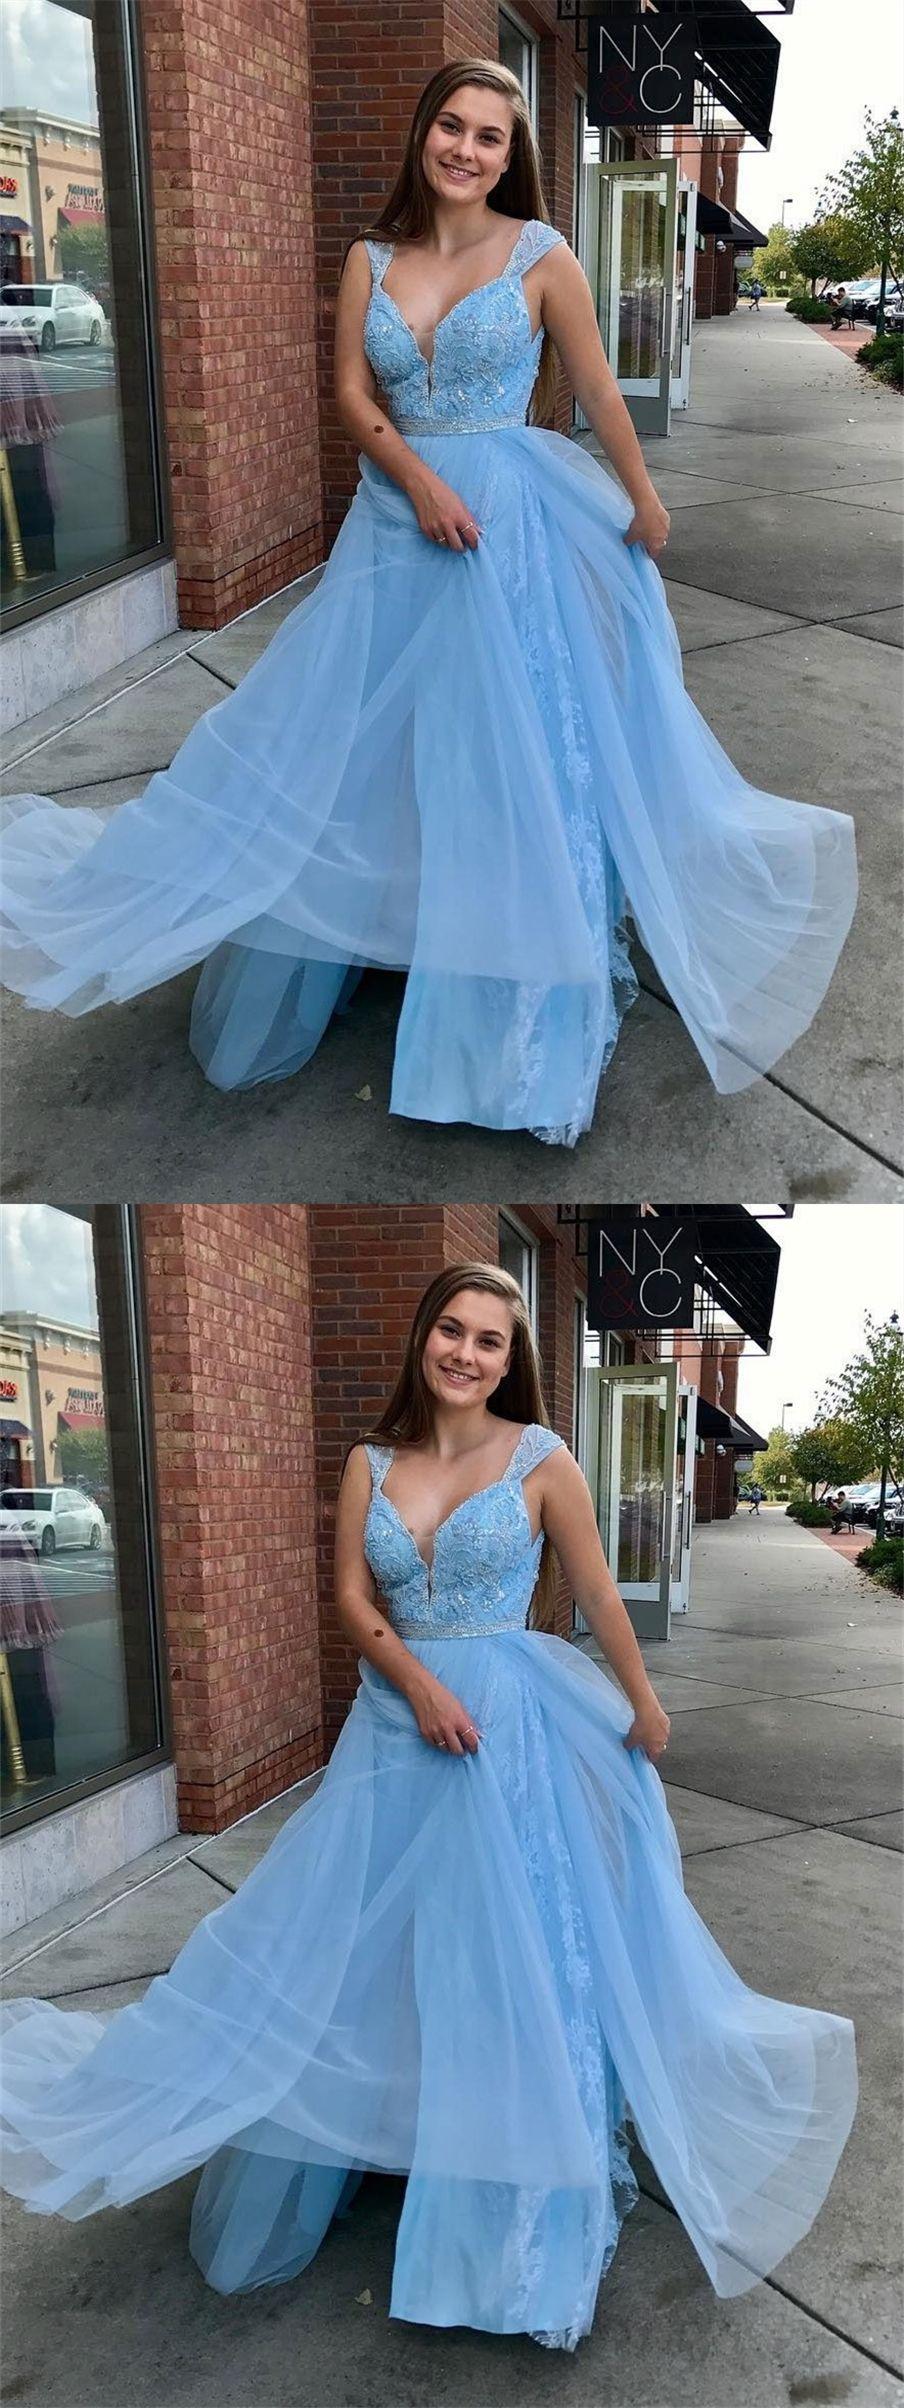 A Line Straps Floor Length Light Blue Prom Dress With Lace Beading Light Blue Prom Dress Prom Dresses Blue Blush Prom Dress [ 2408 x 904 Pixel ]